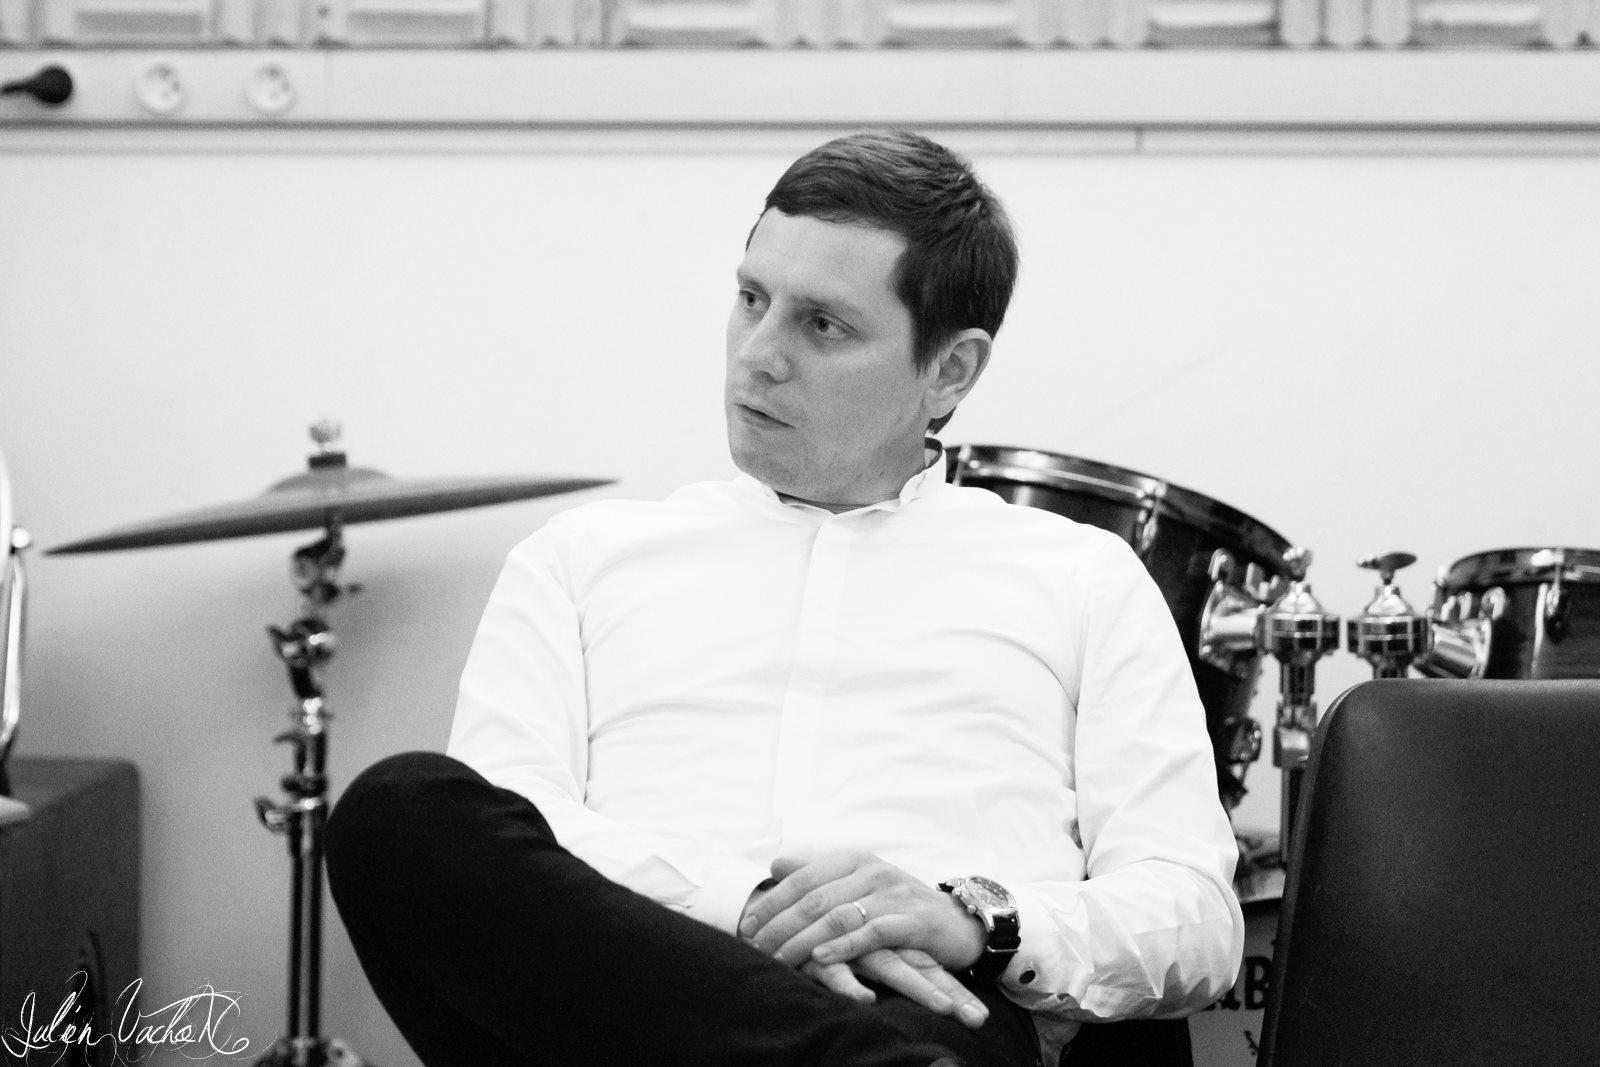 Jean-Pierre Dréau – Jive Epic / Sony Music France